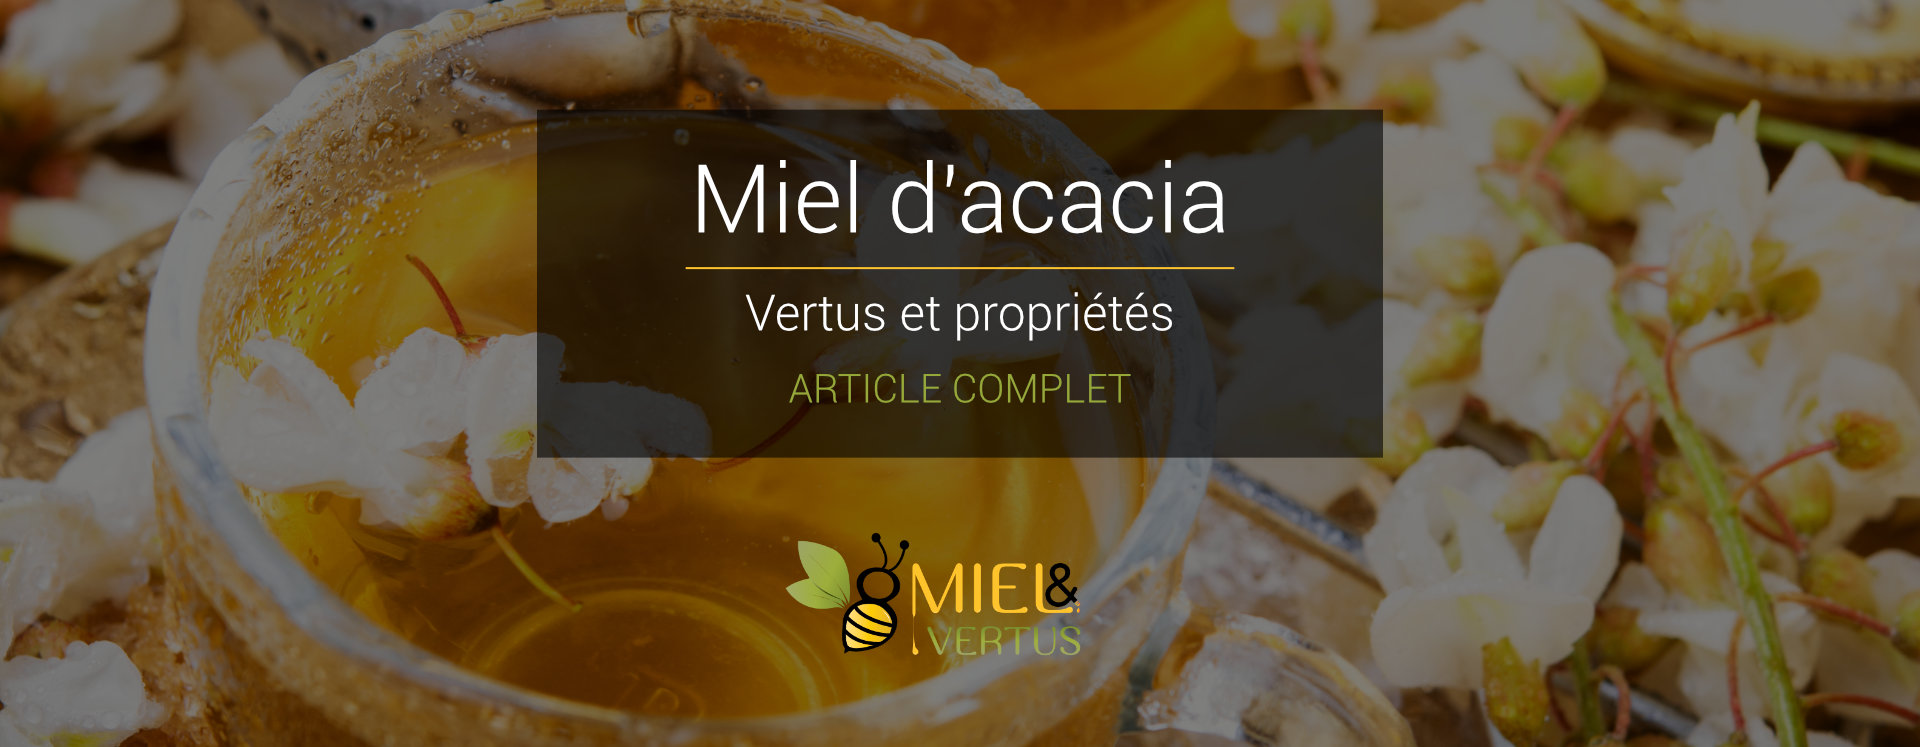 miel-acacia-vertus-proprietes